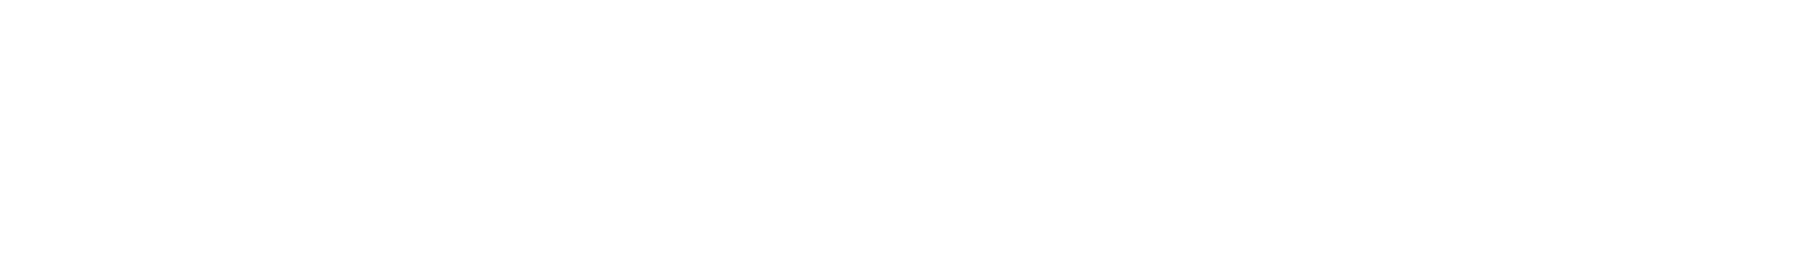 dts chordlp 44 f wet